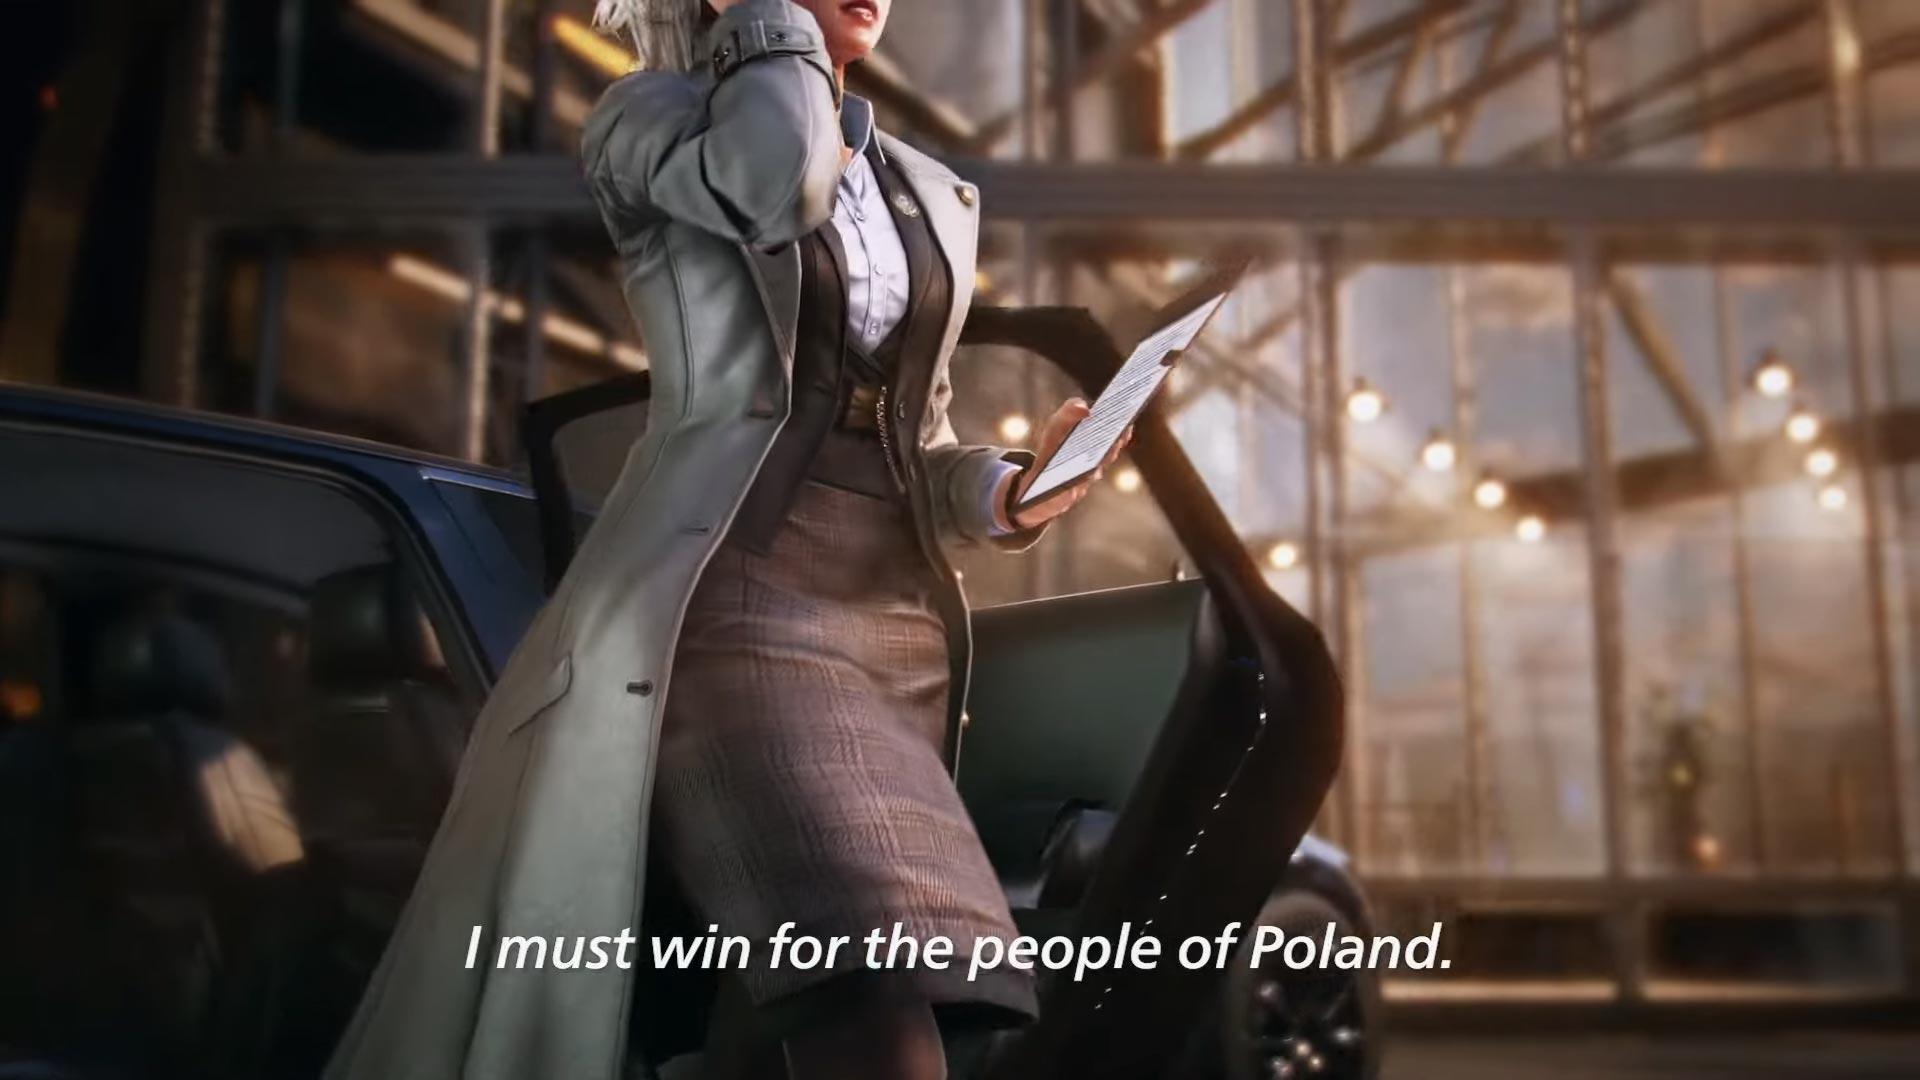 Tekken Polish Prime Minister Teaser Image Gallery 2 out of 3 image gallery